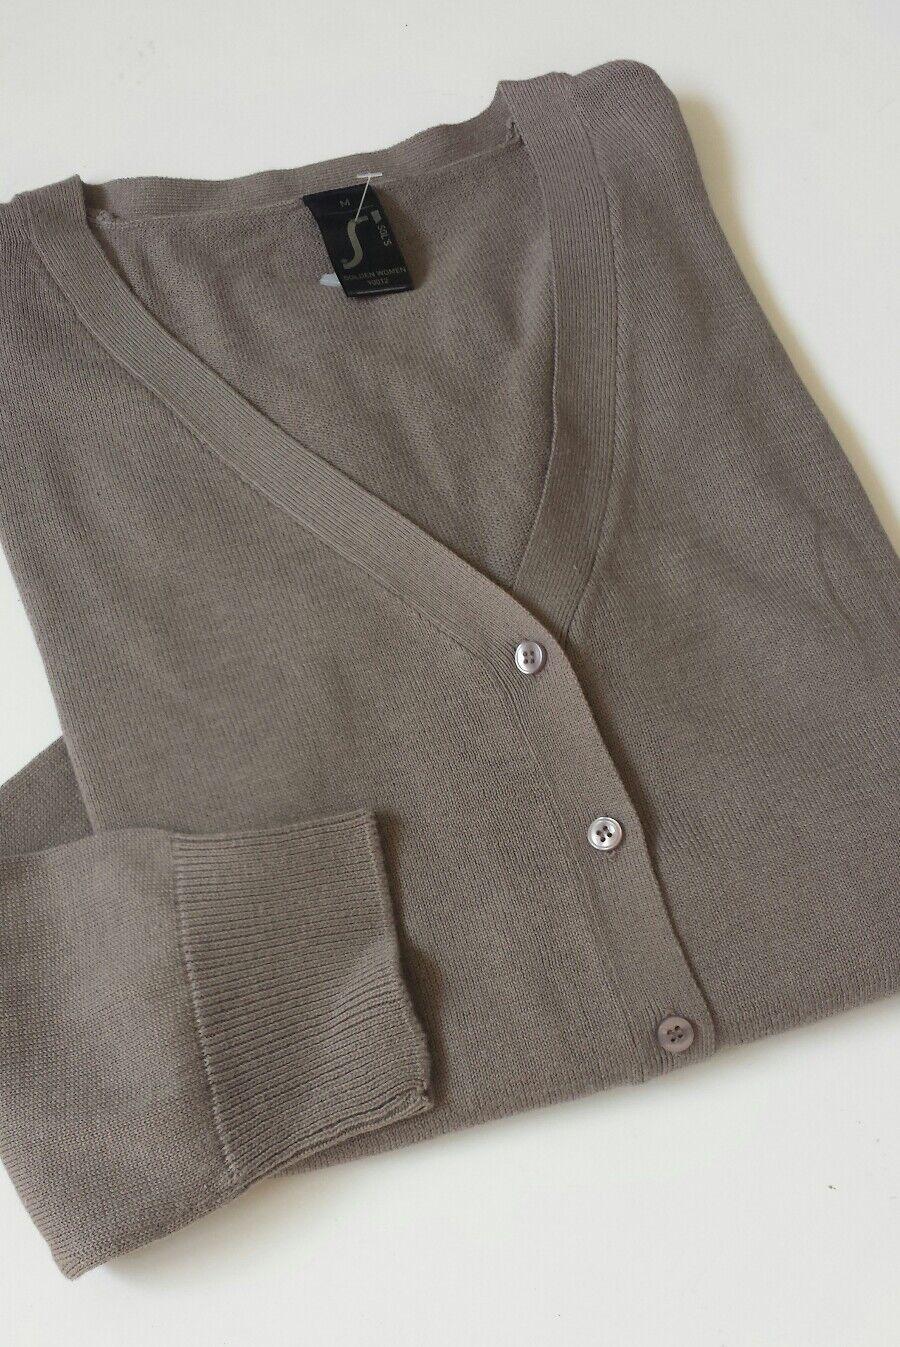 Women's SOL'S golden Women  cardigan taupe color  size M BNWOT